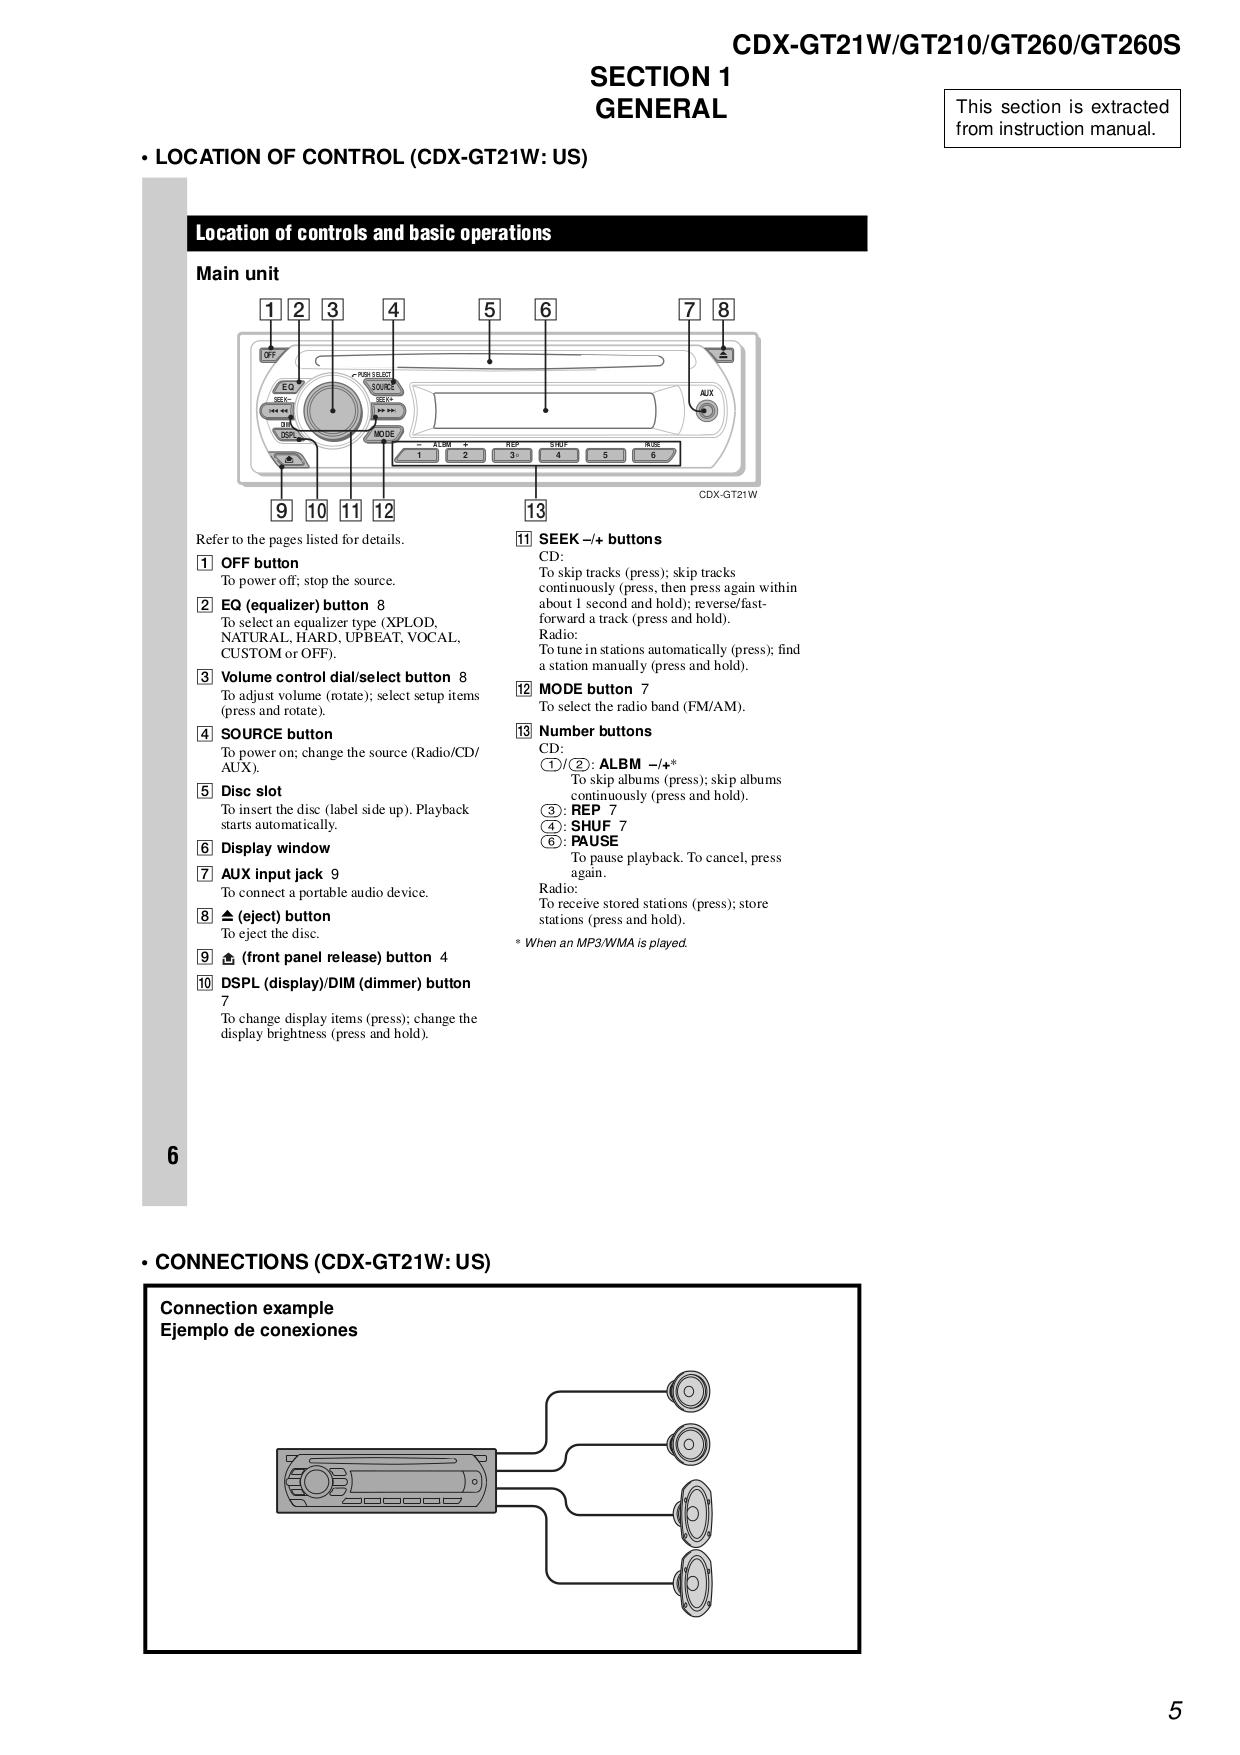 Sony Cdx Gt210 Wiring Diagram